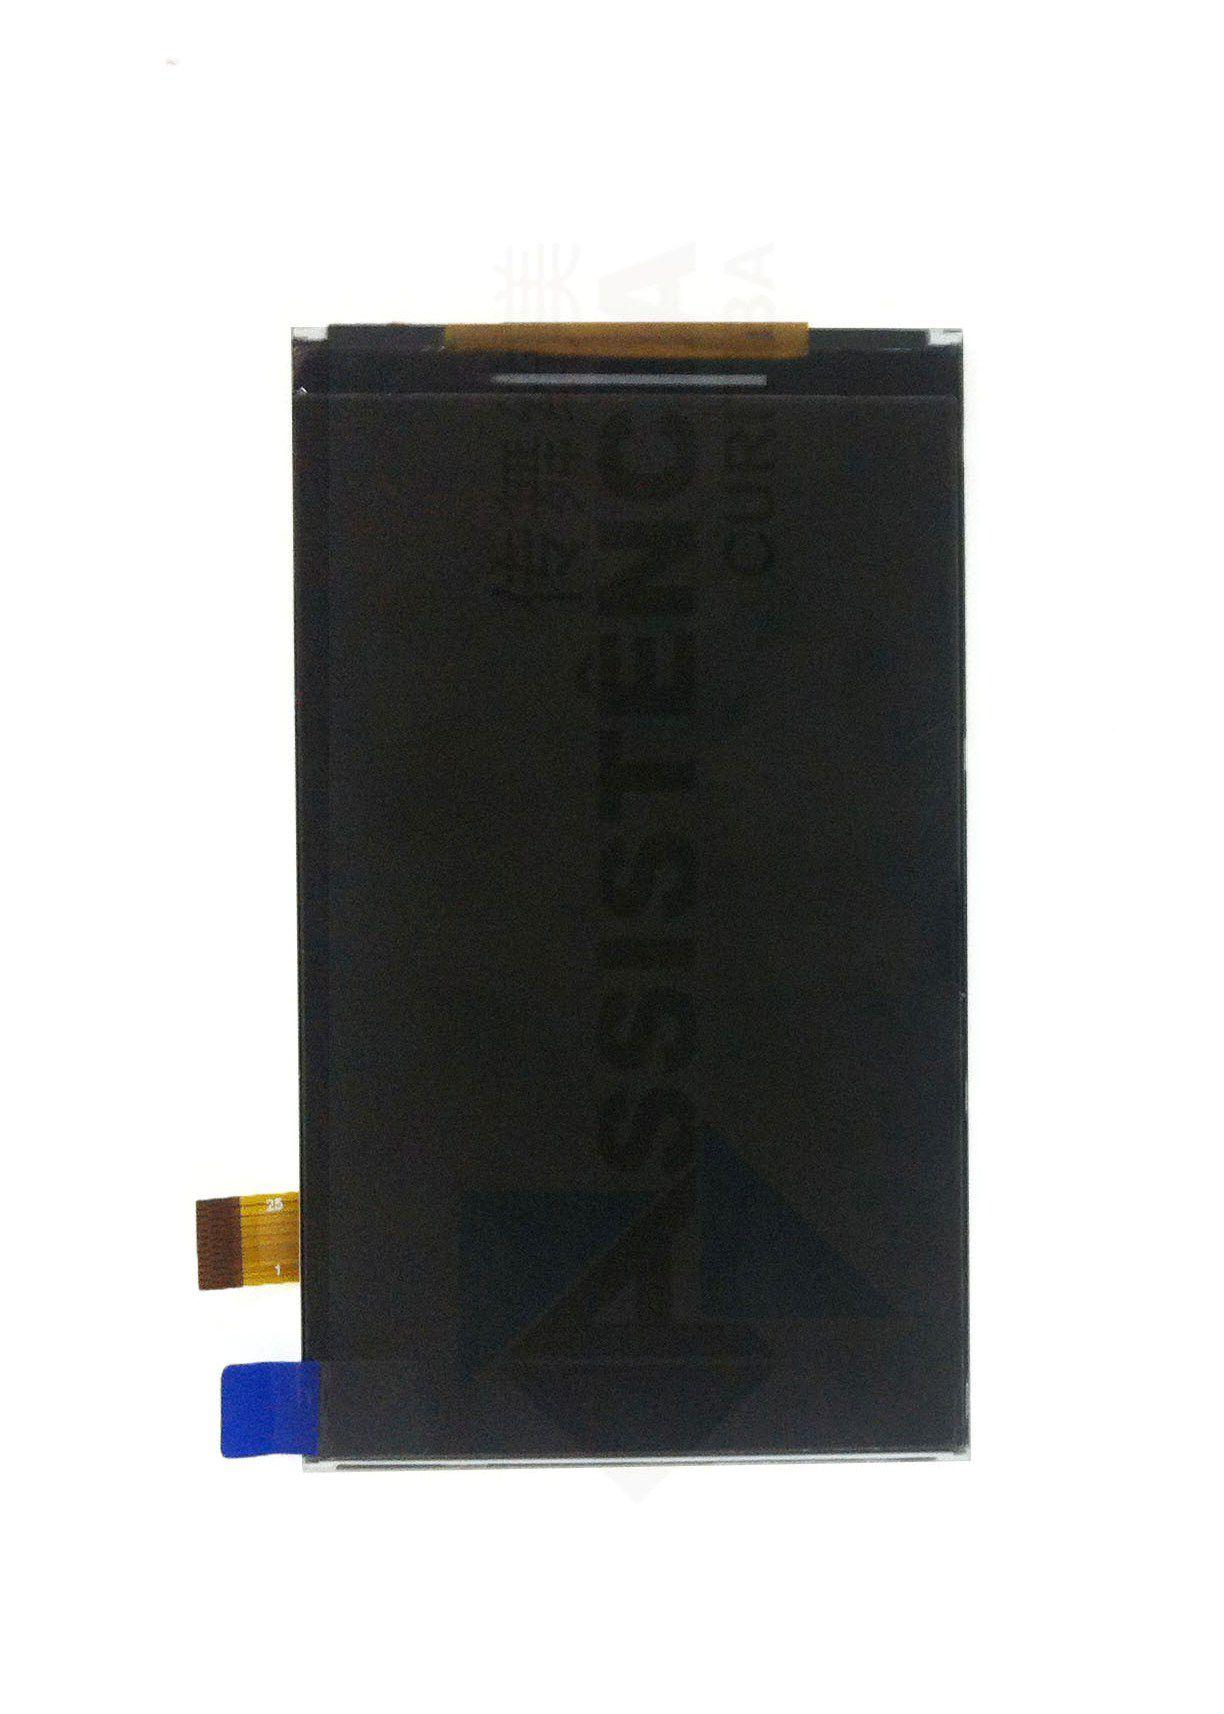 Display Multilaser Ms40 4